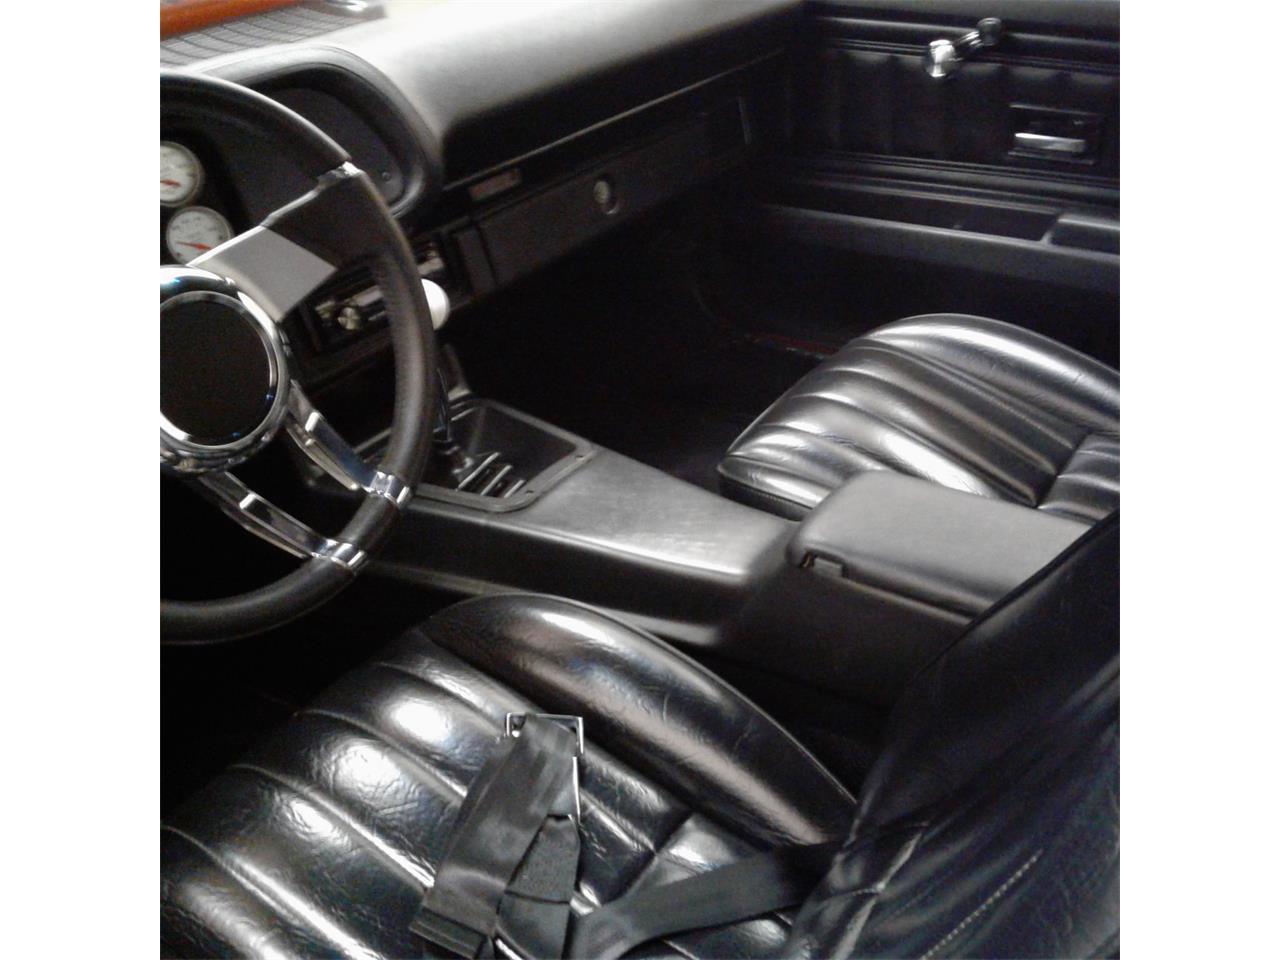 1973 Chevrolet Camaro RS (CC-1270048) for sale in Bullhead City, Arizona